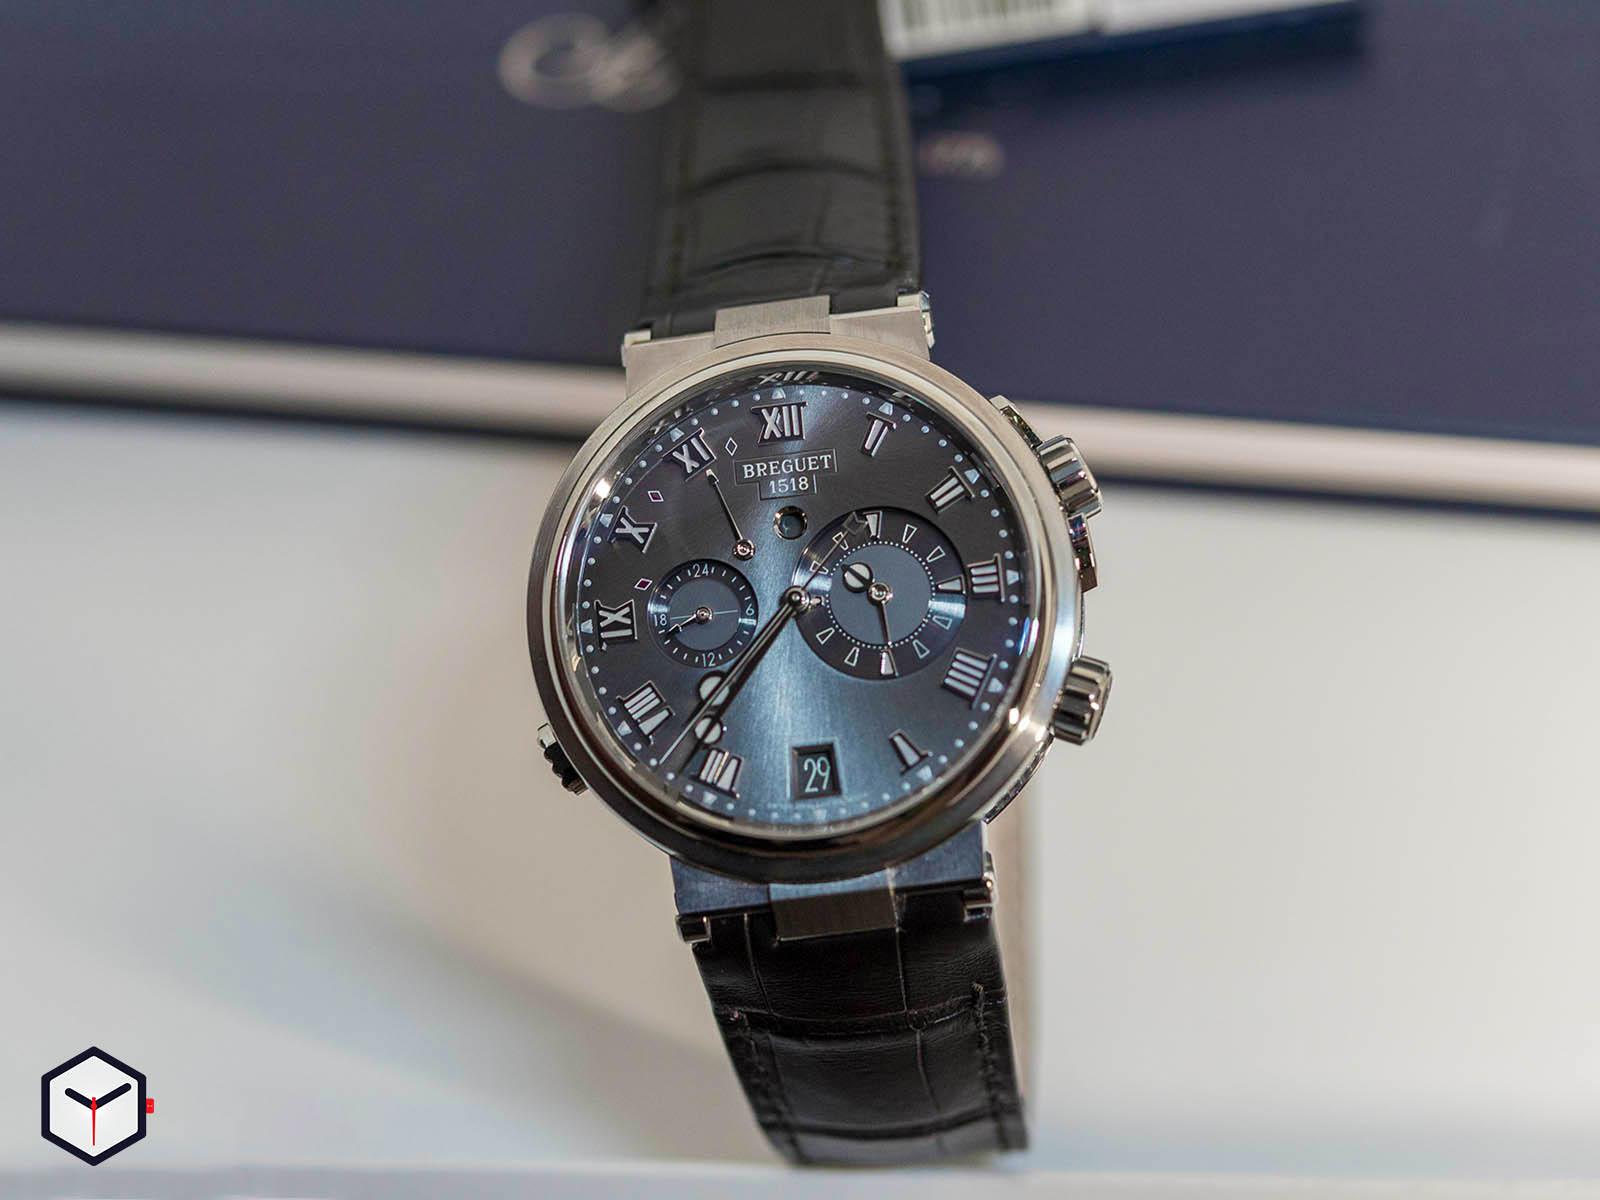 mechanical-alarm-watches-breguet-marine-alarme-musicale-1.jpg